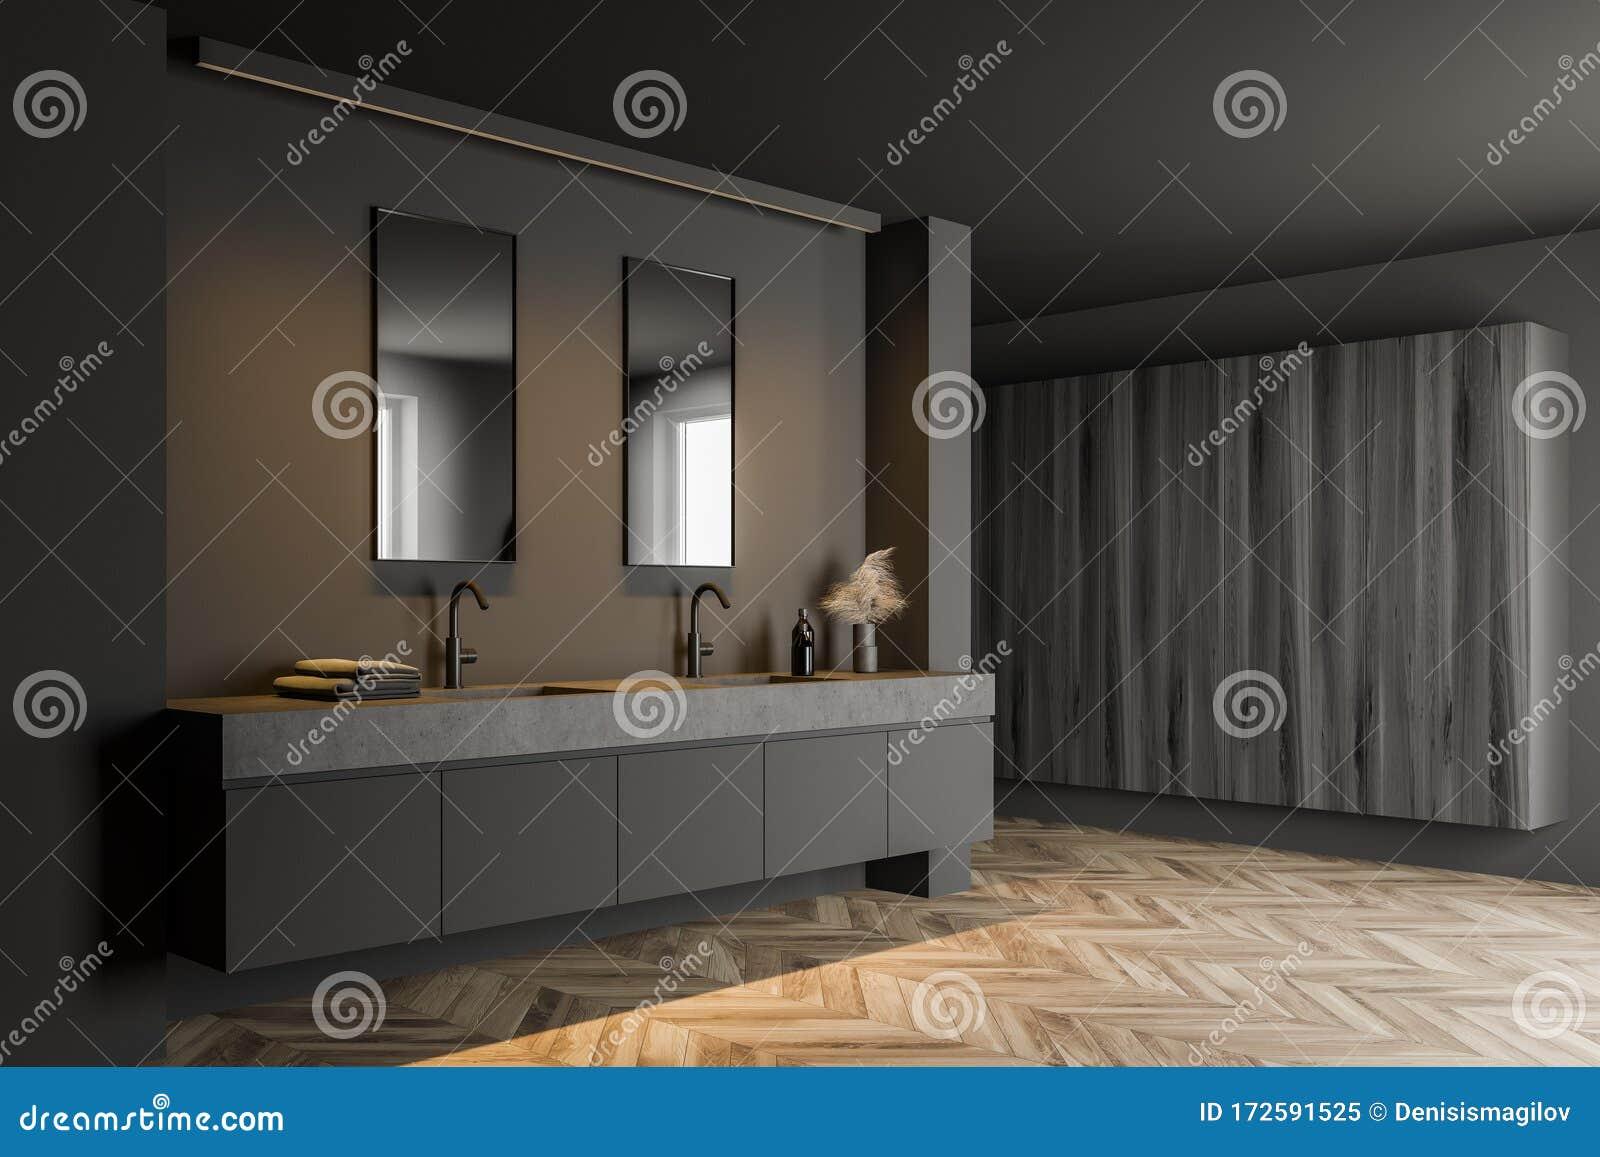 Gray Bathroom Corner With Double Sink Stock Illustration Illustration Of Modern Indoor 172591525